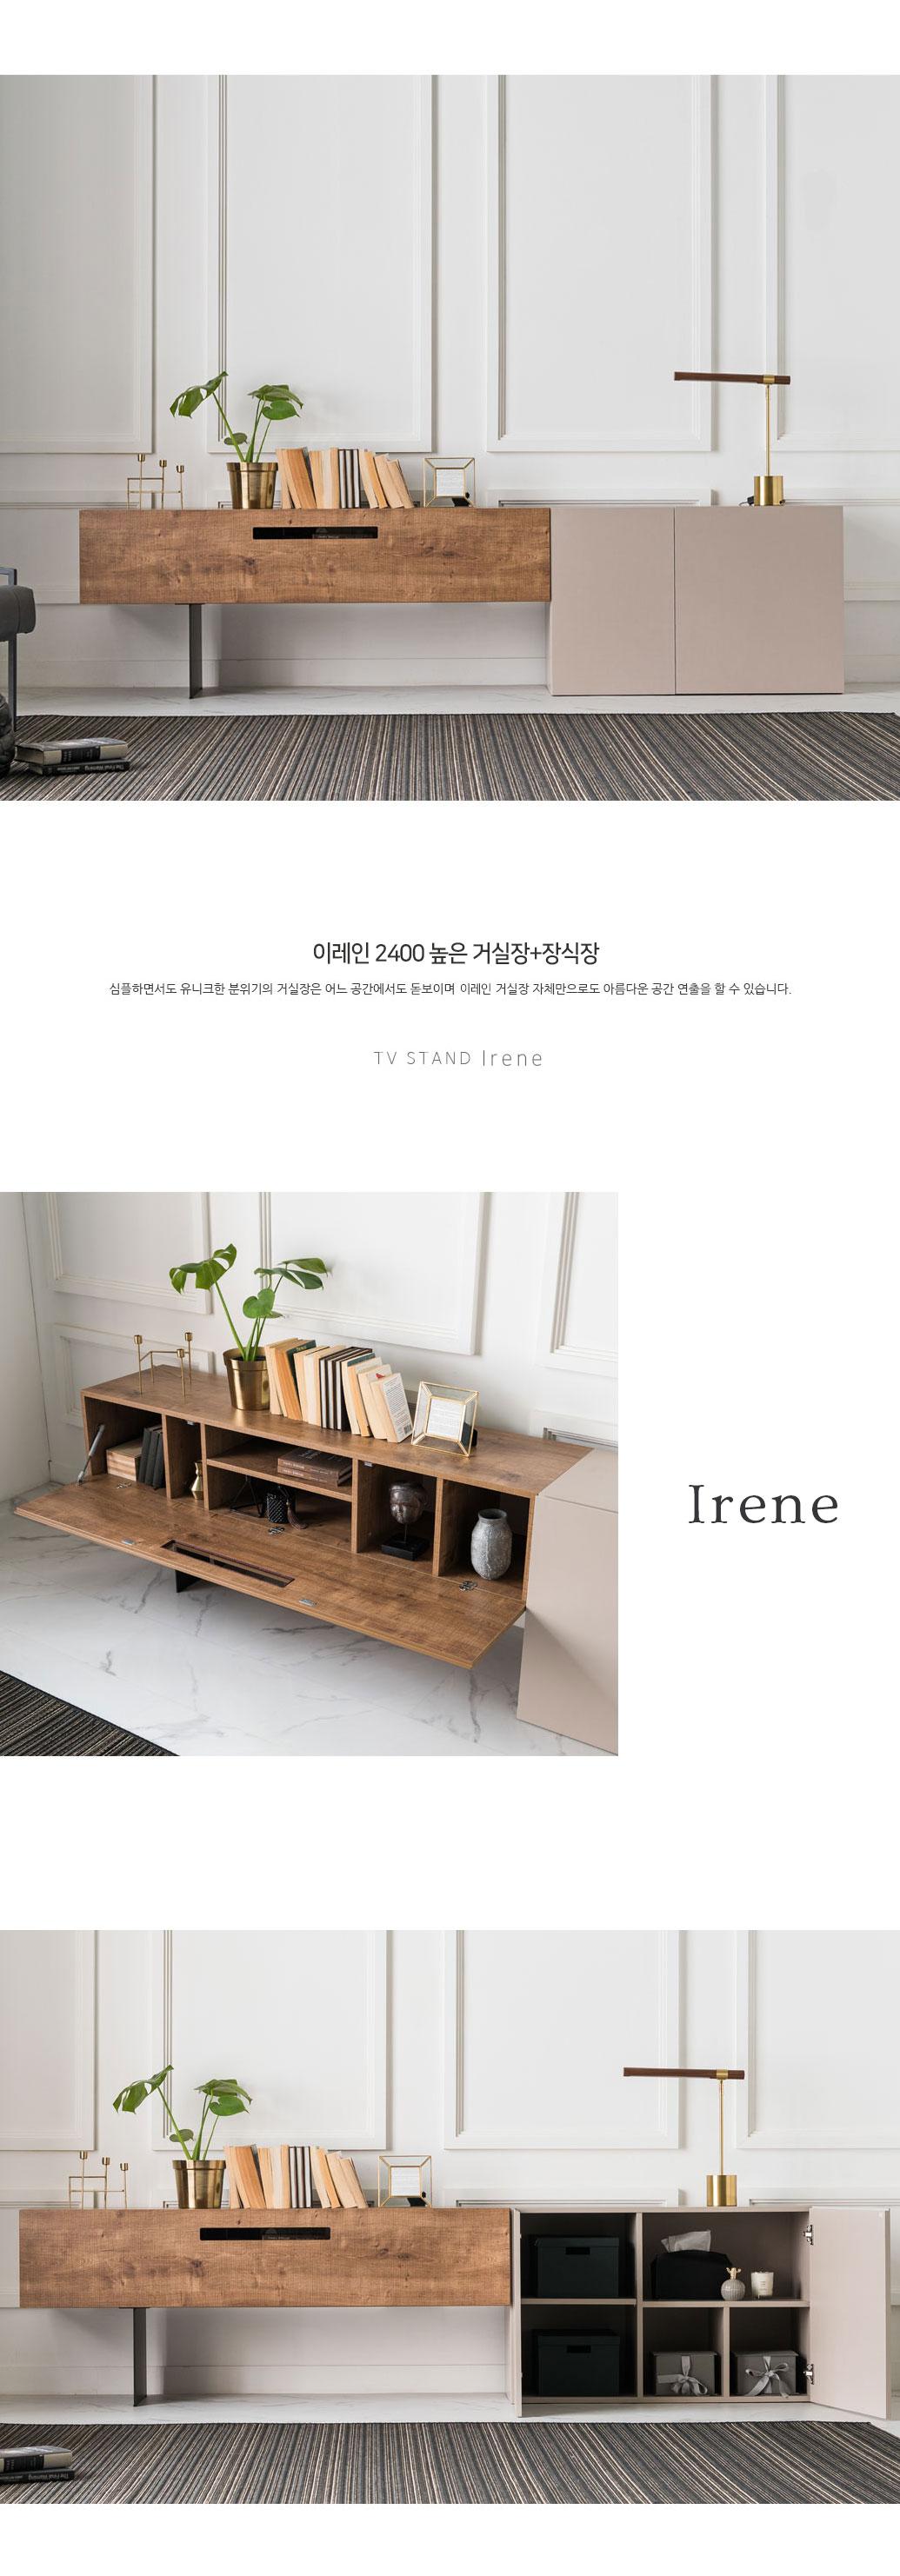 Irene_high2_02.jpg